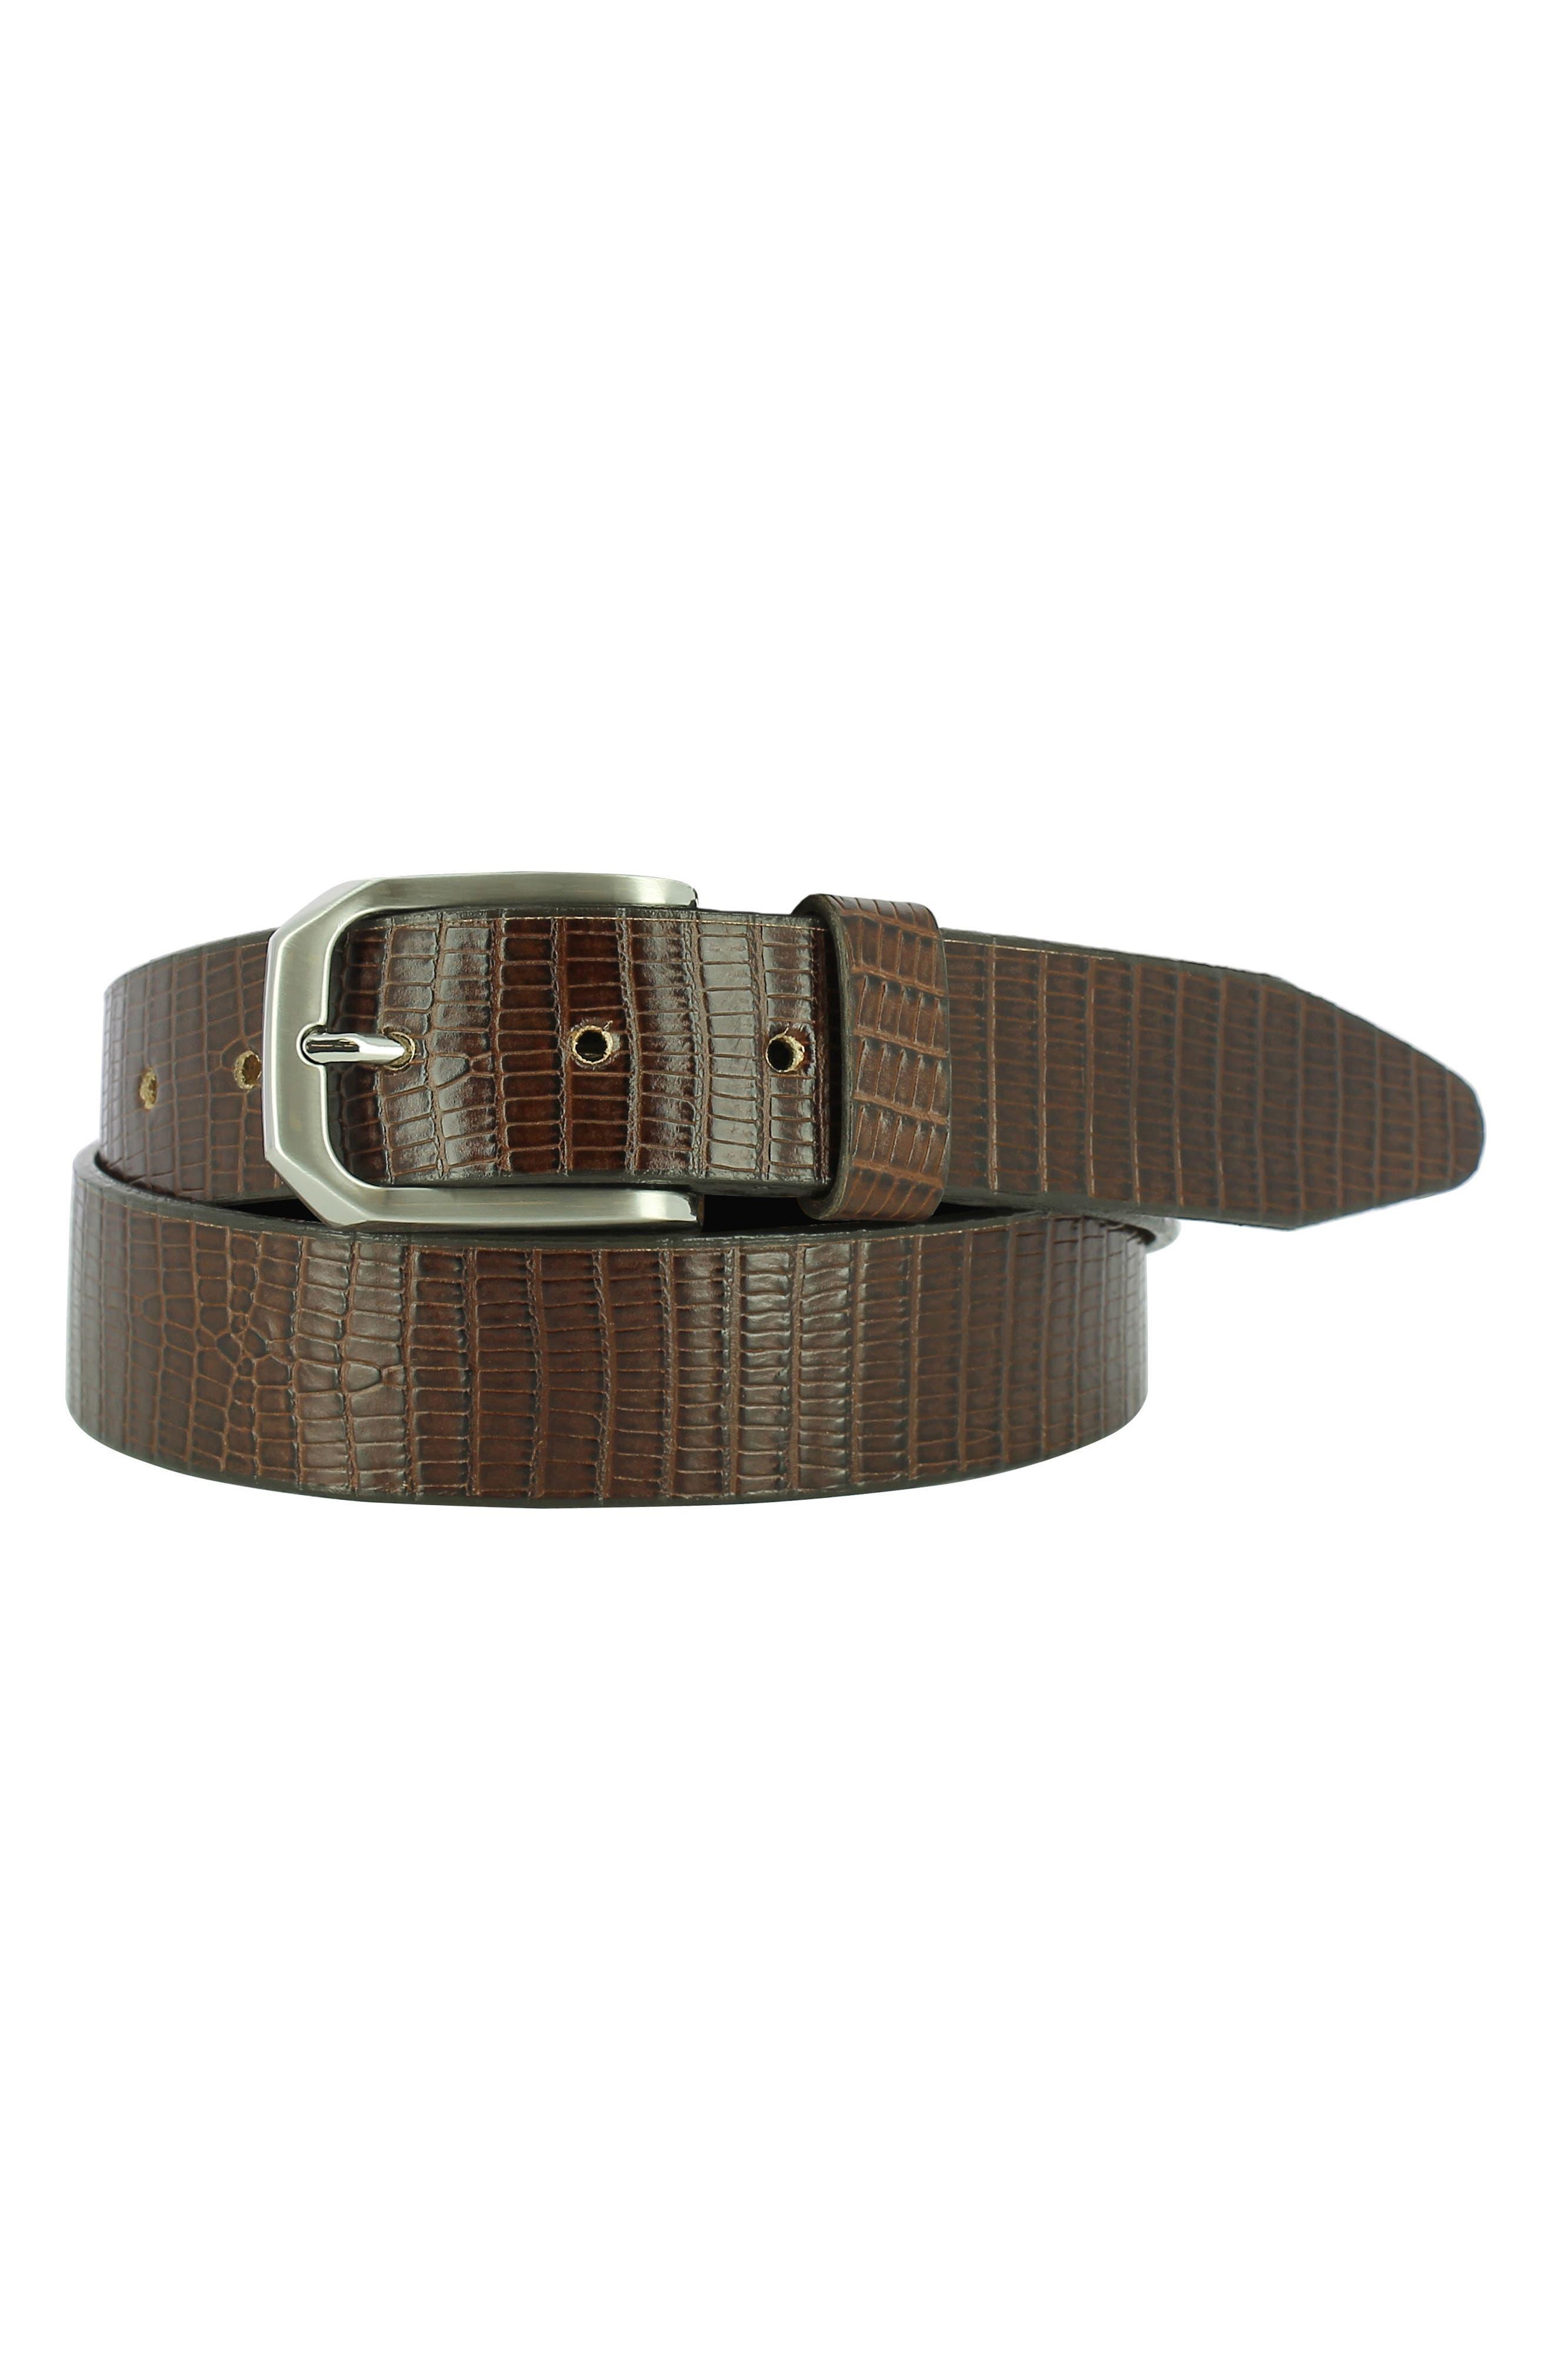 Remo Tulliani Edward Leather Belt, Tan